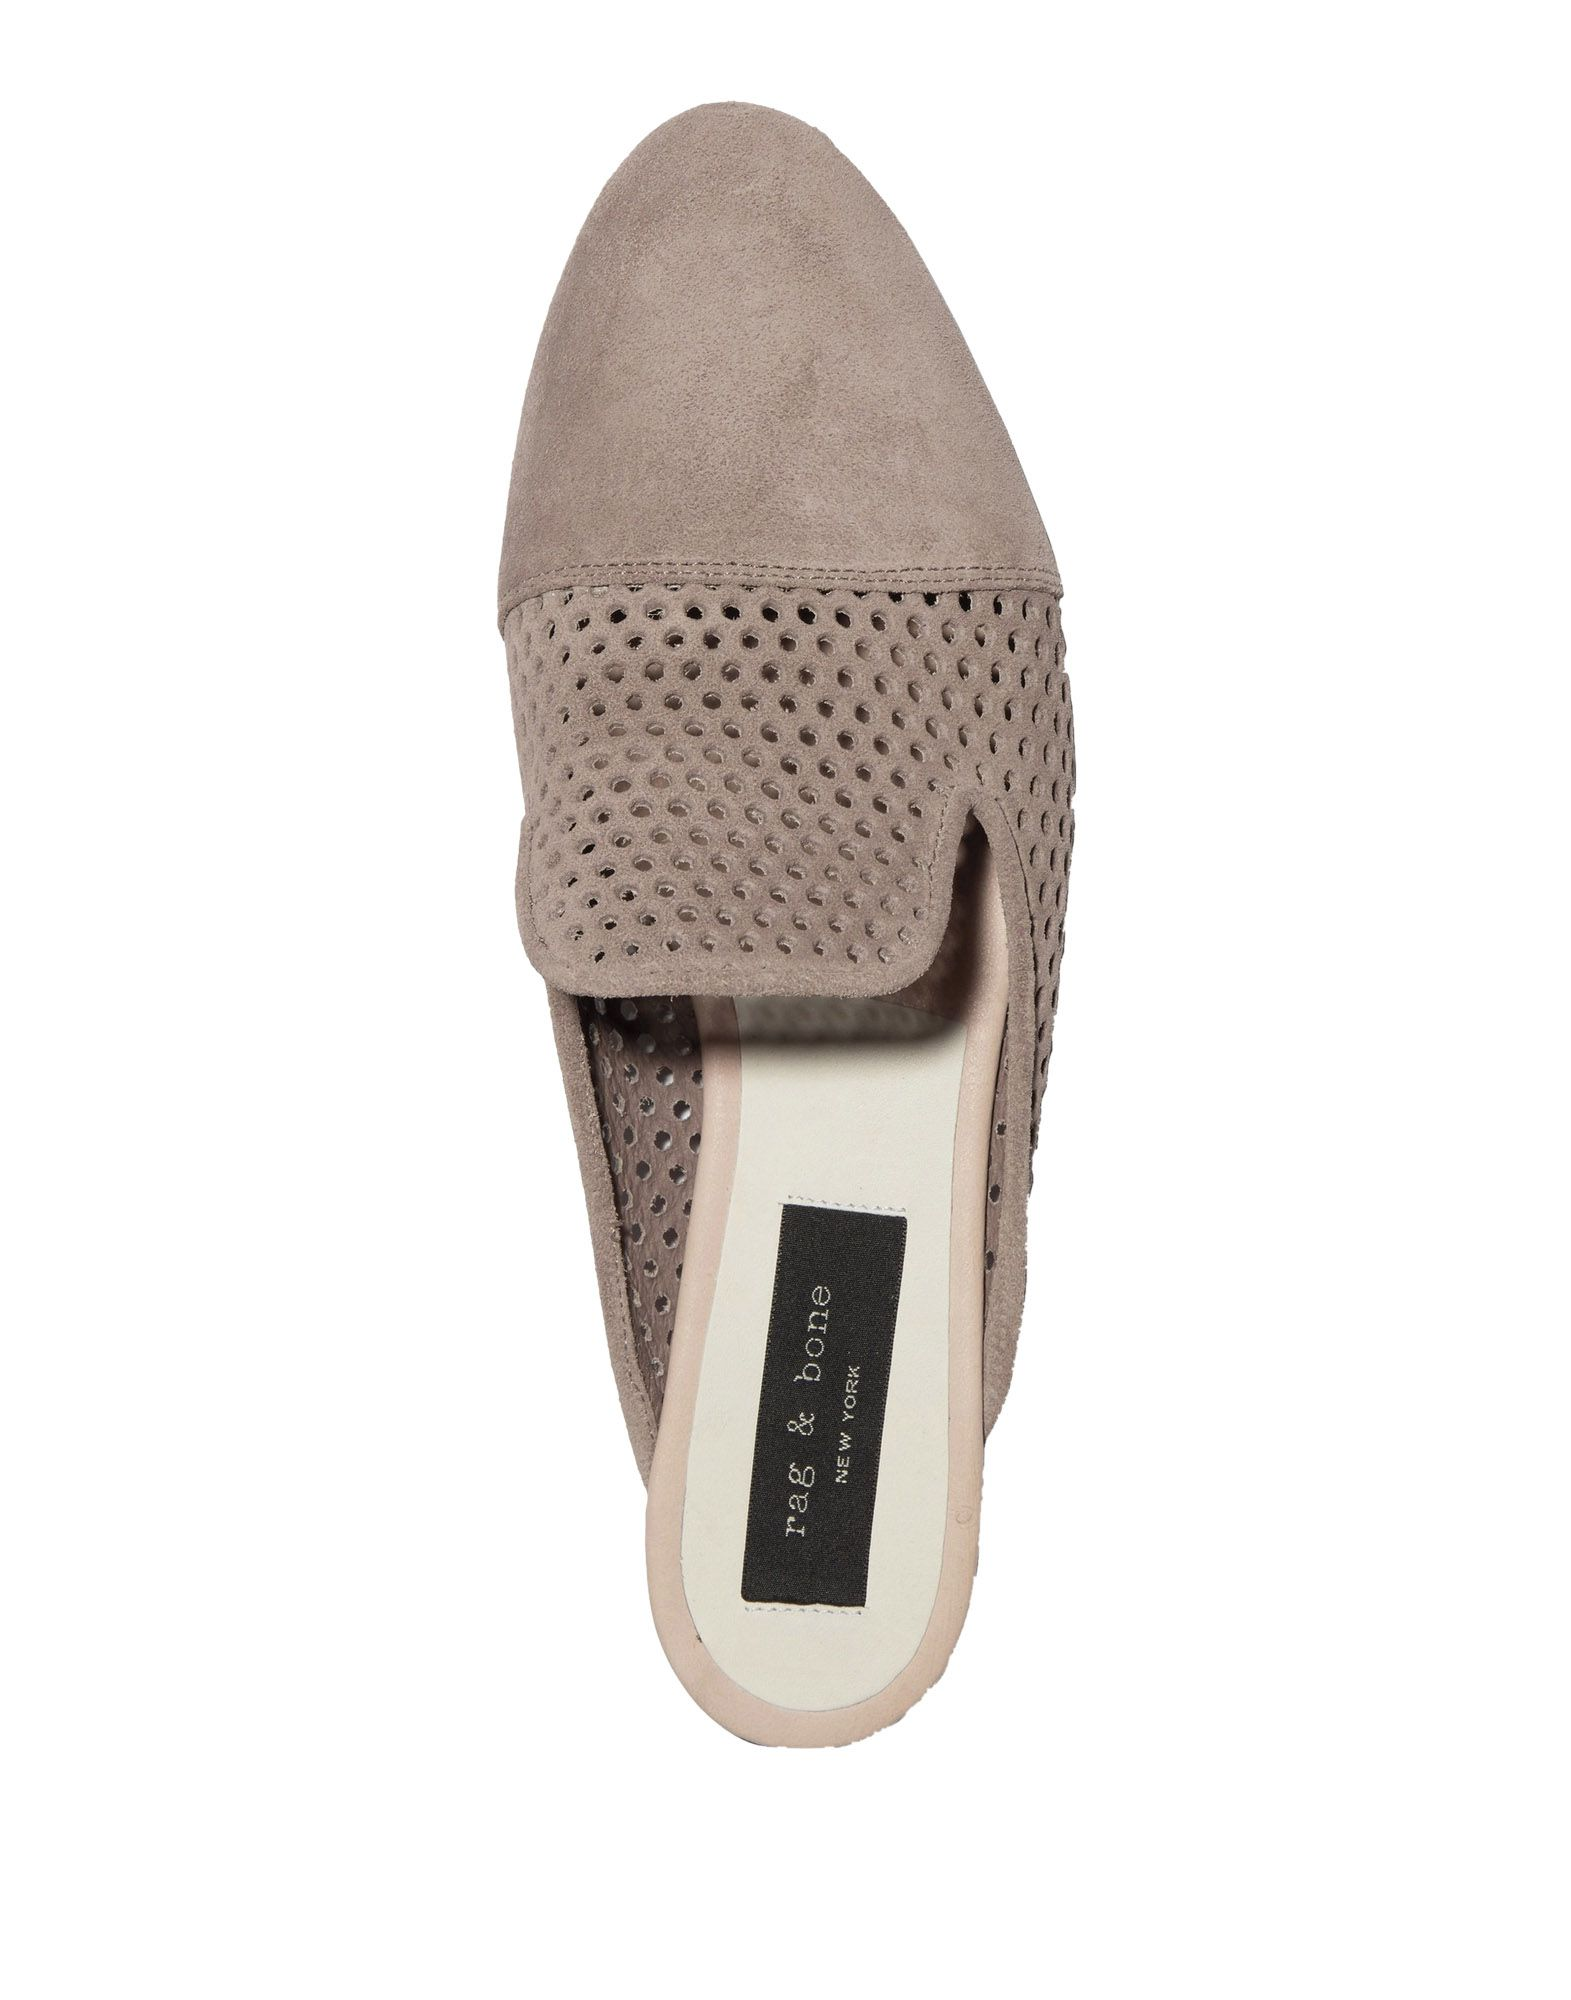 Rag & Bone Pantoletten Schuhe Damen  11524238BE Neue Schuhe Pantoletten 9a0309